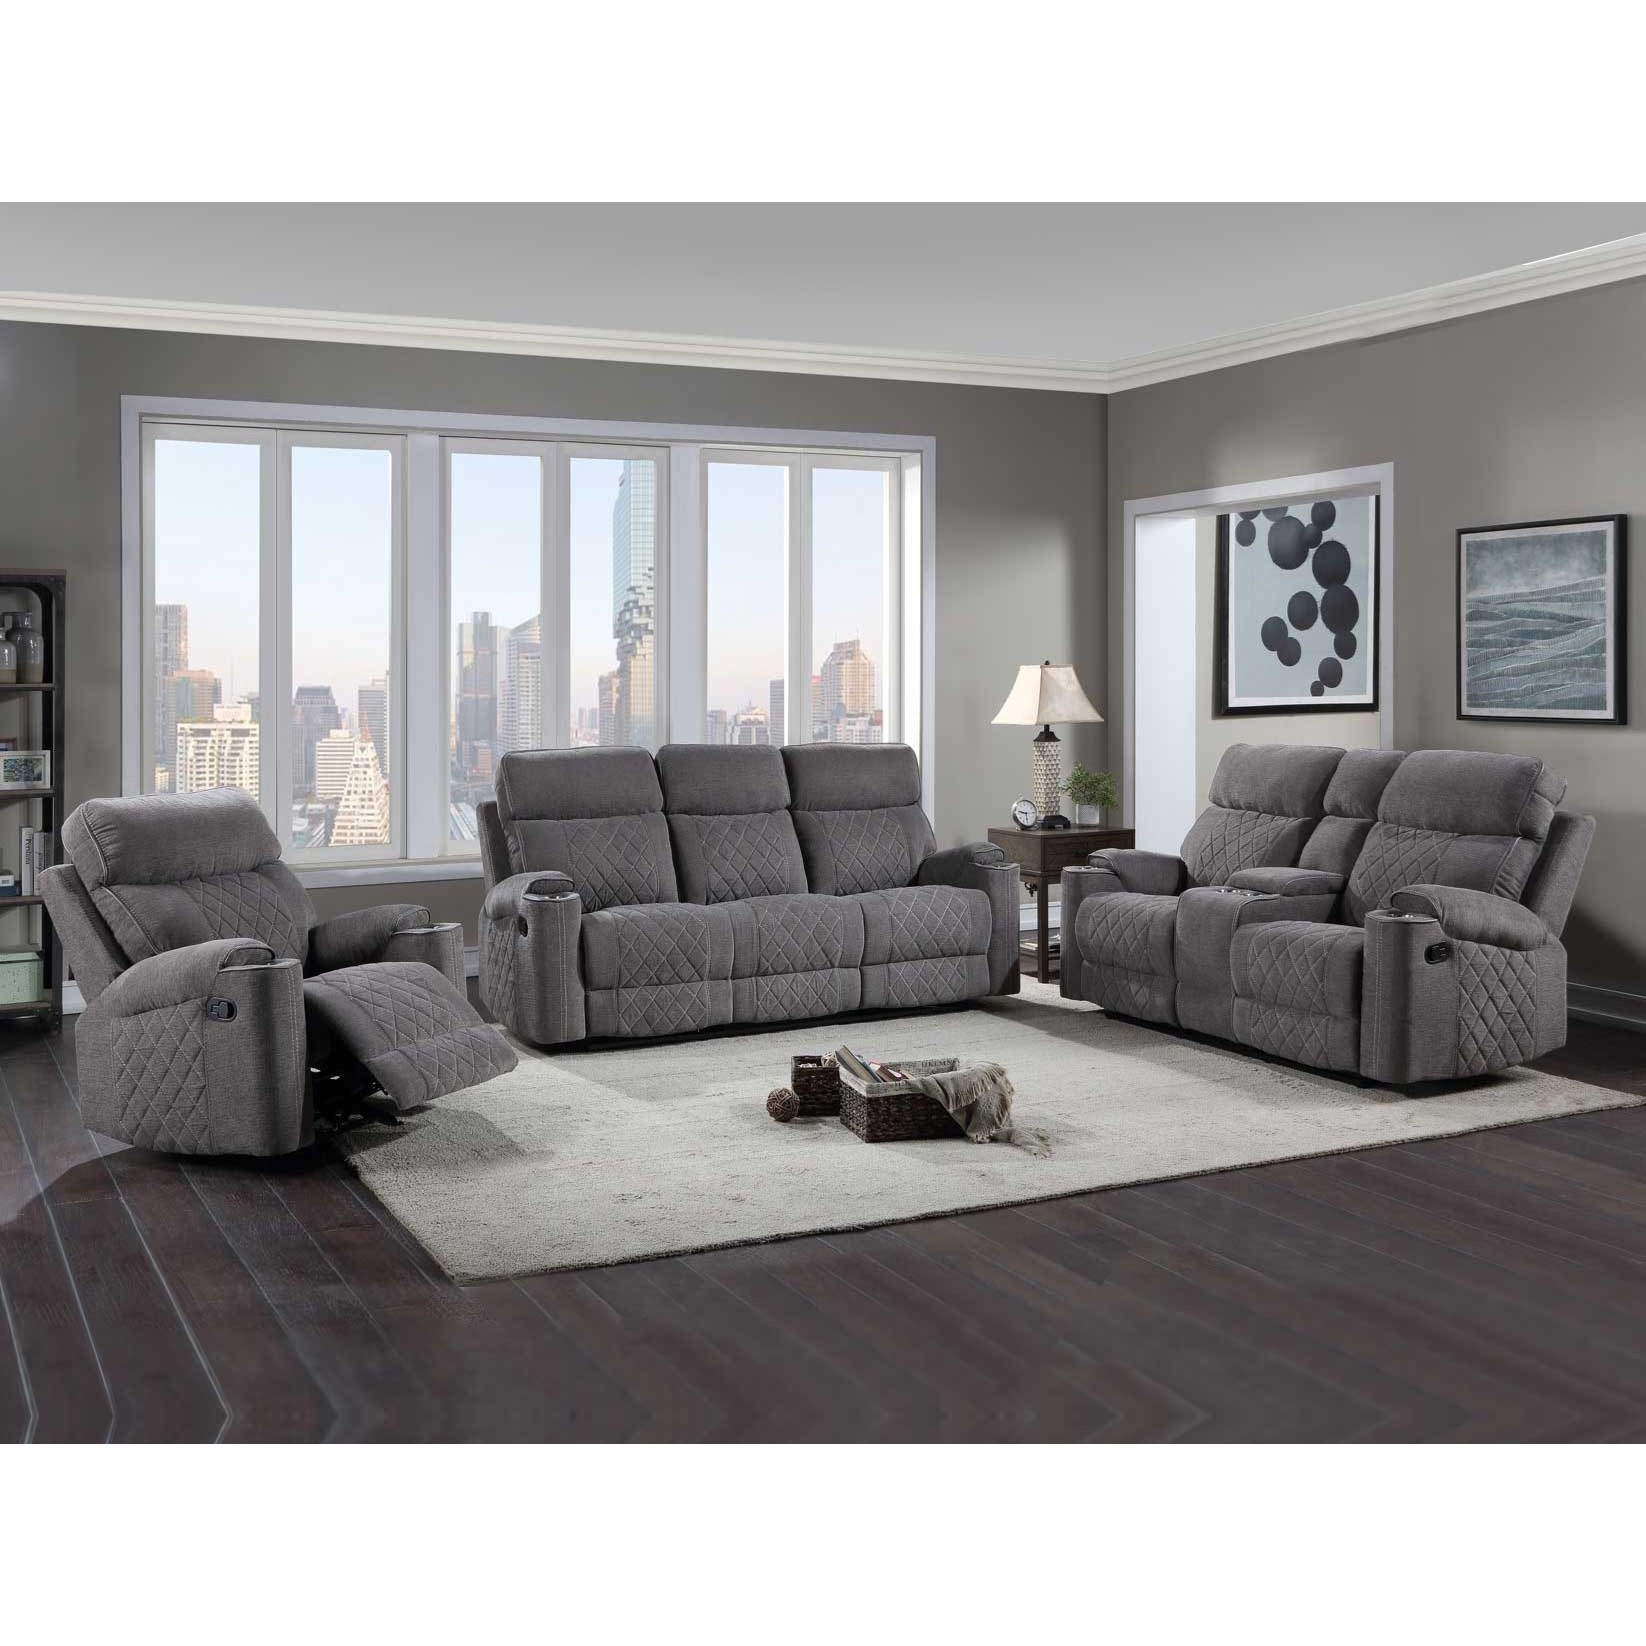 Crawford Reclining Living Room Group at Sadler's Home Furnishings